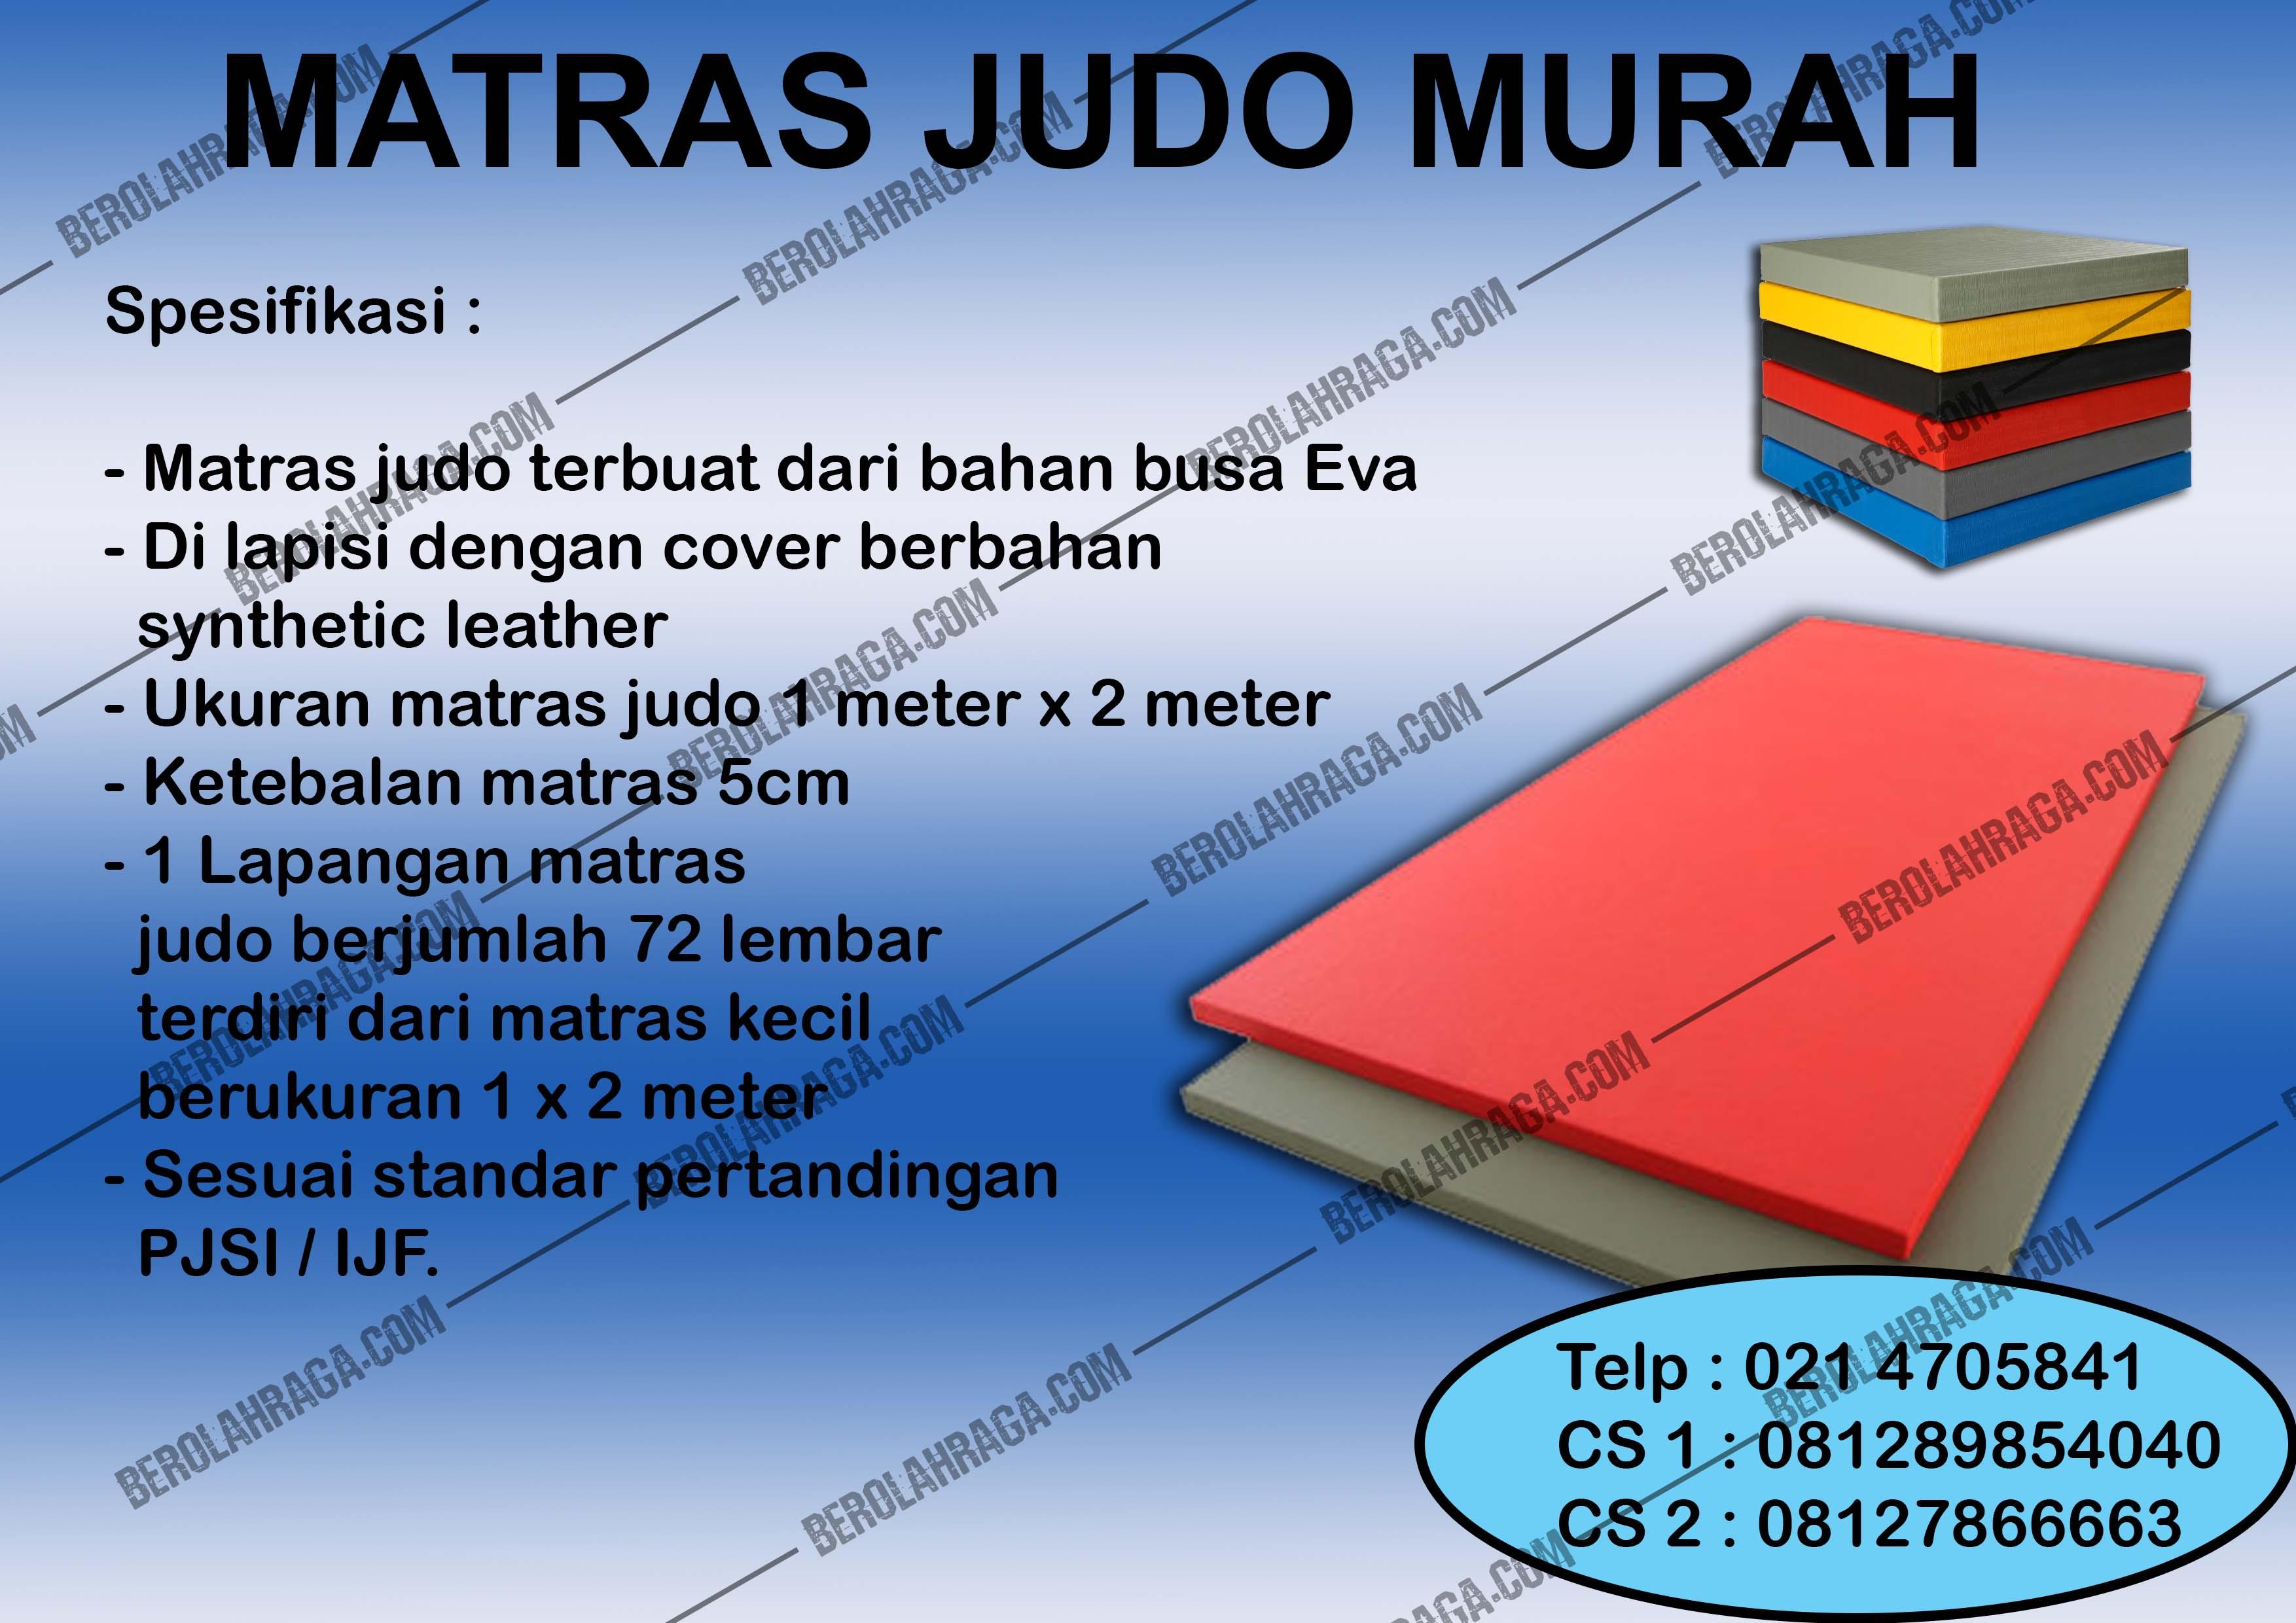 Matras Beladiri Judo Standard Kompetisi, Produsen, Agen Perlengkapan Olahraga, beladiri, distributor, supplier, pusat, importir